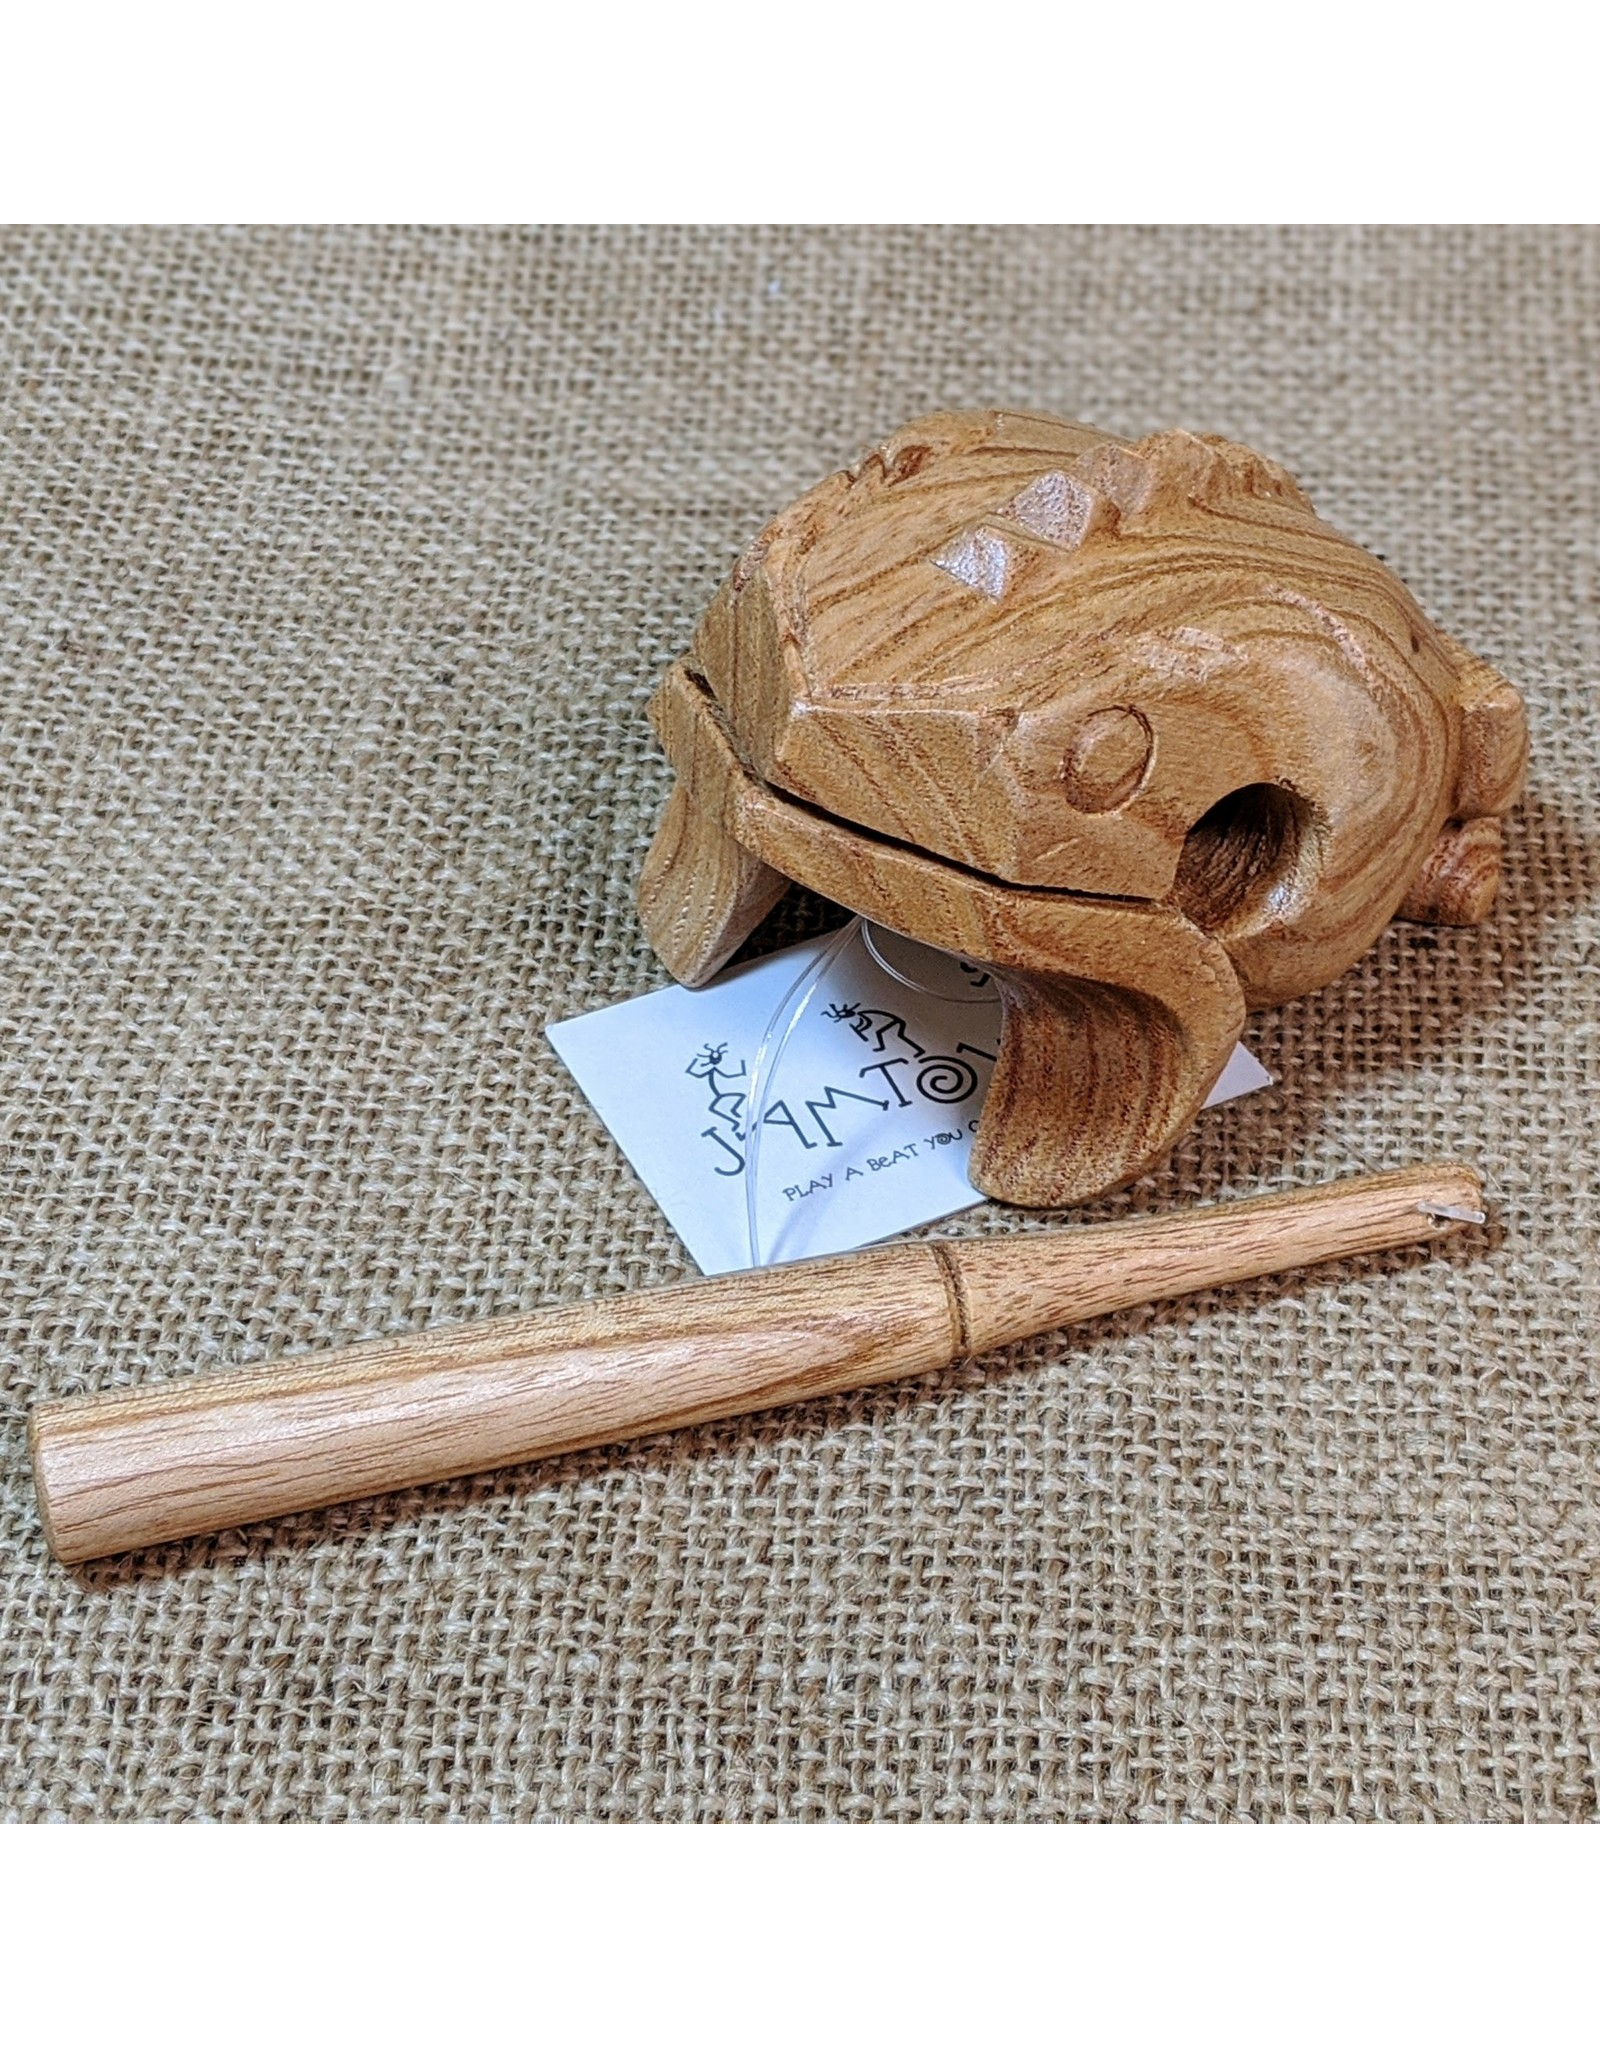 Jamtown Mini Wooden Frog Scraper, Bali